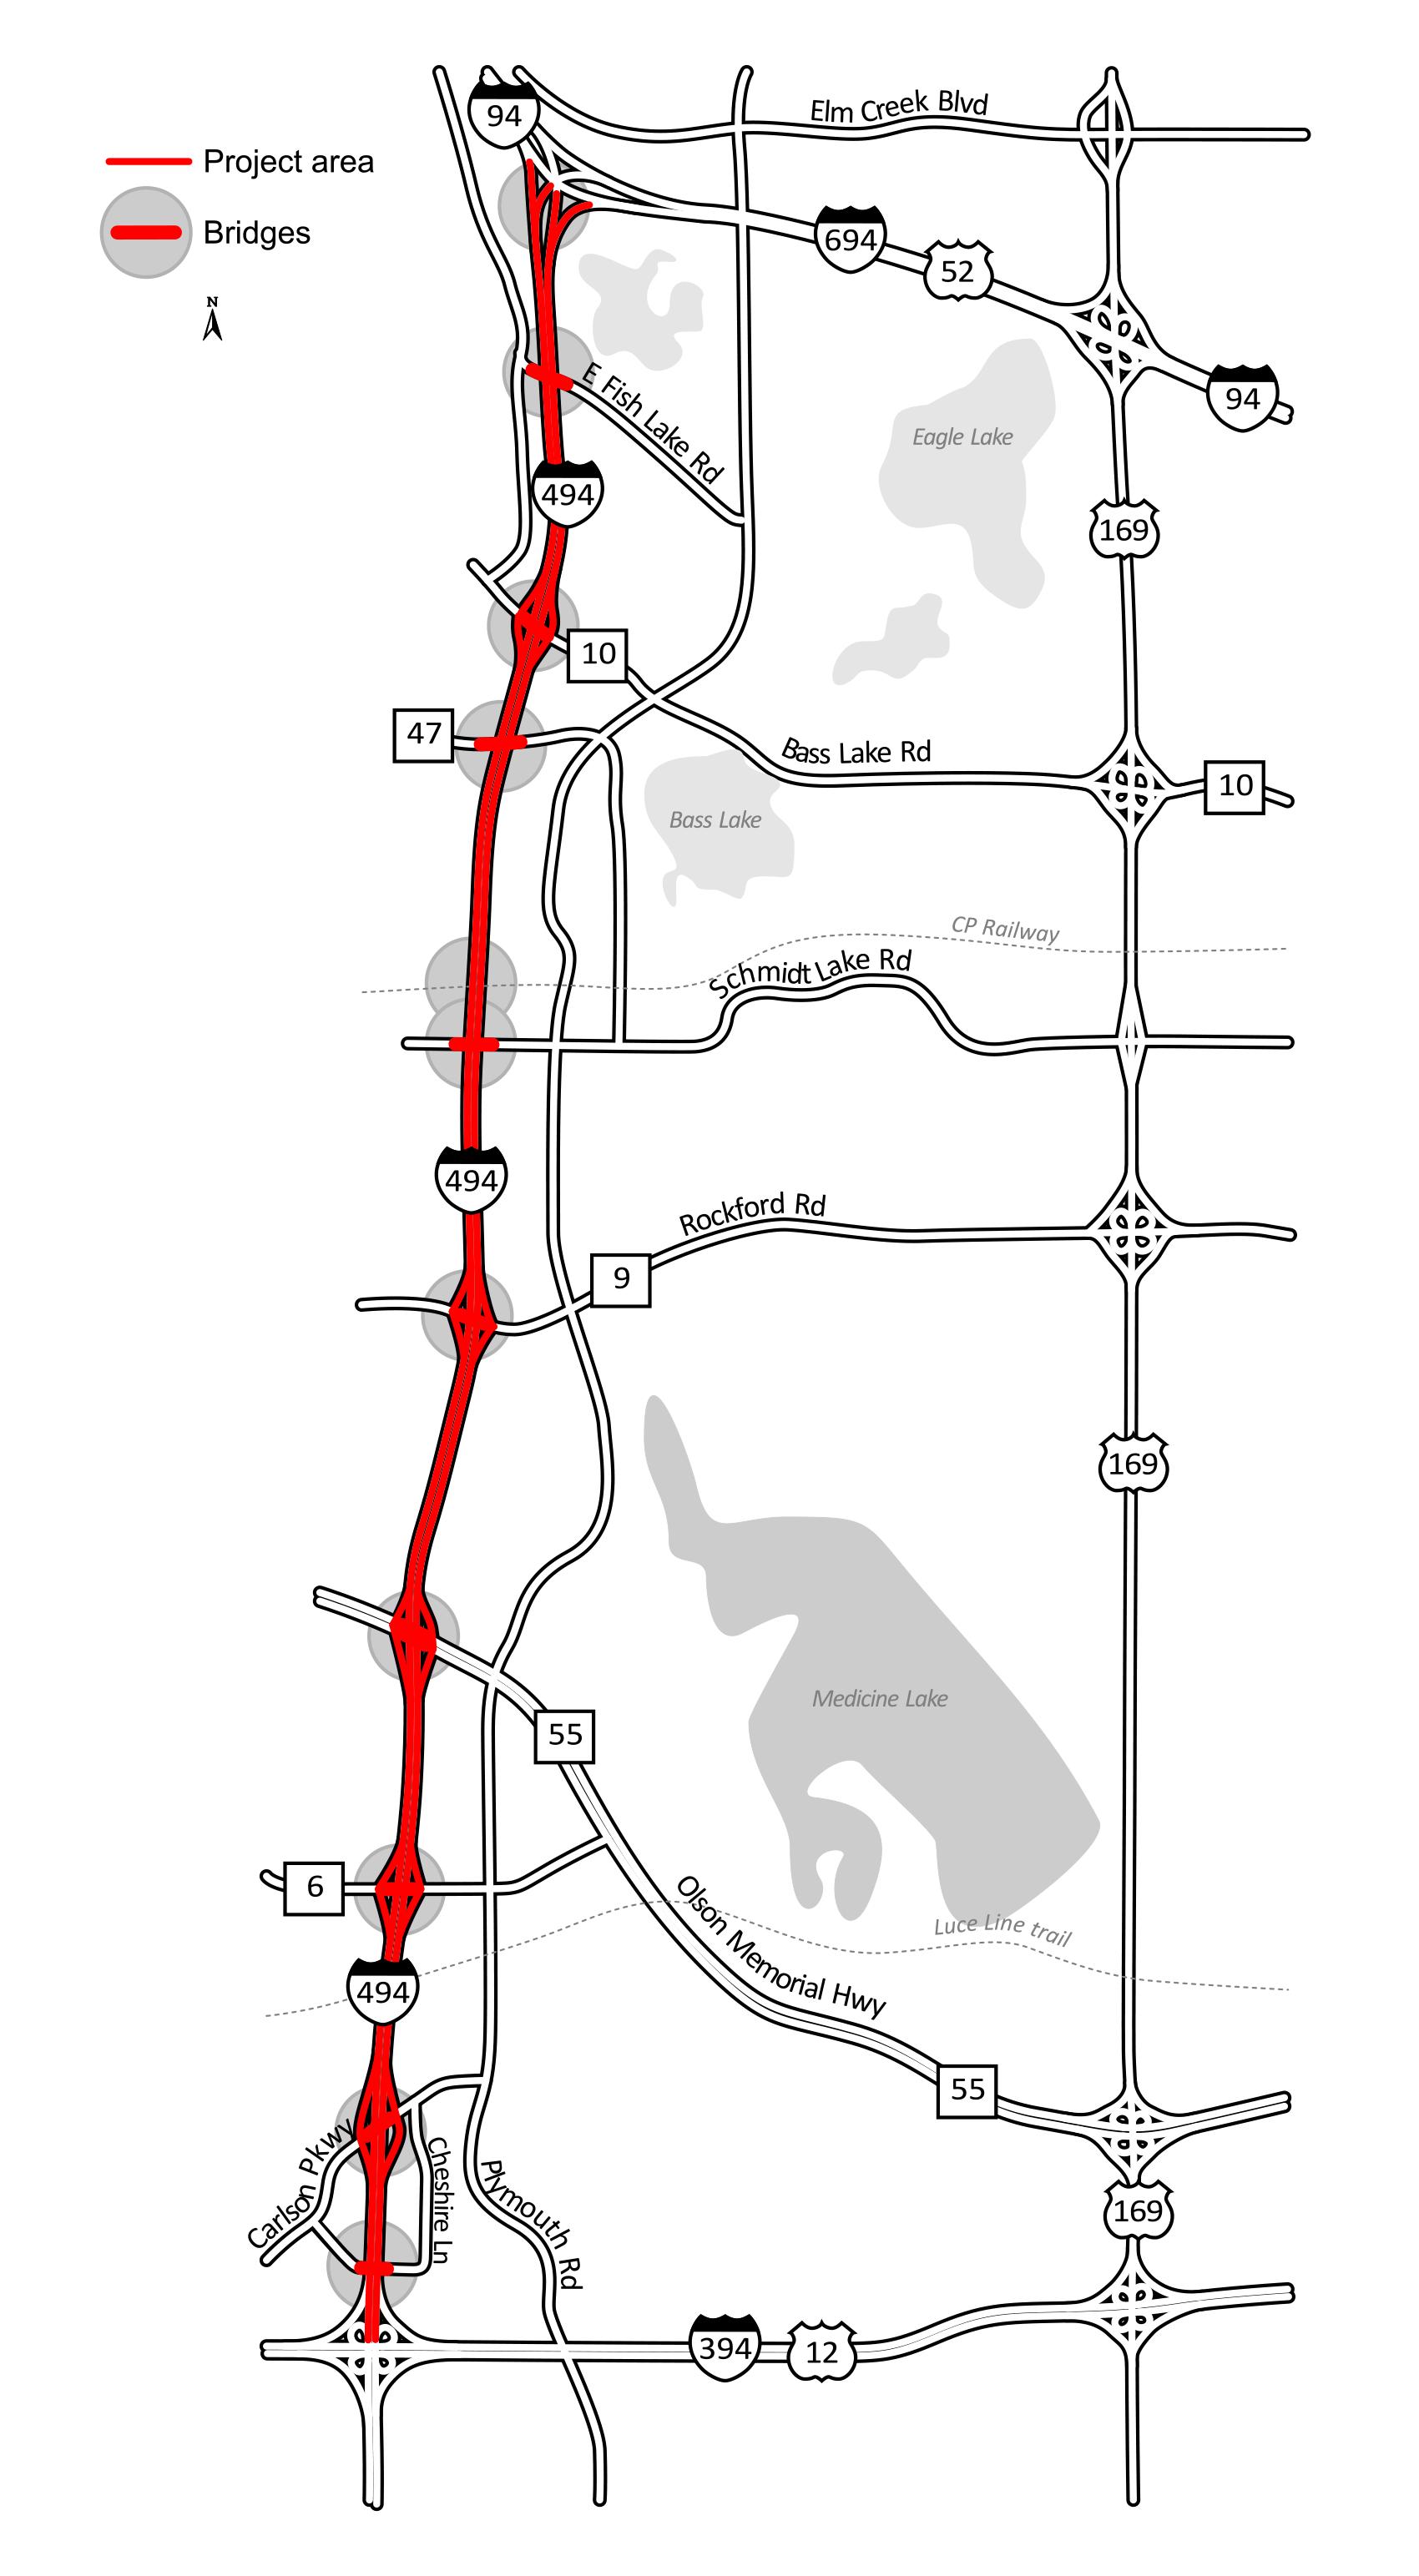 I-494 closure